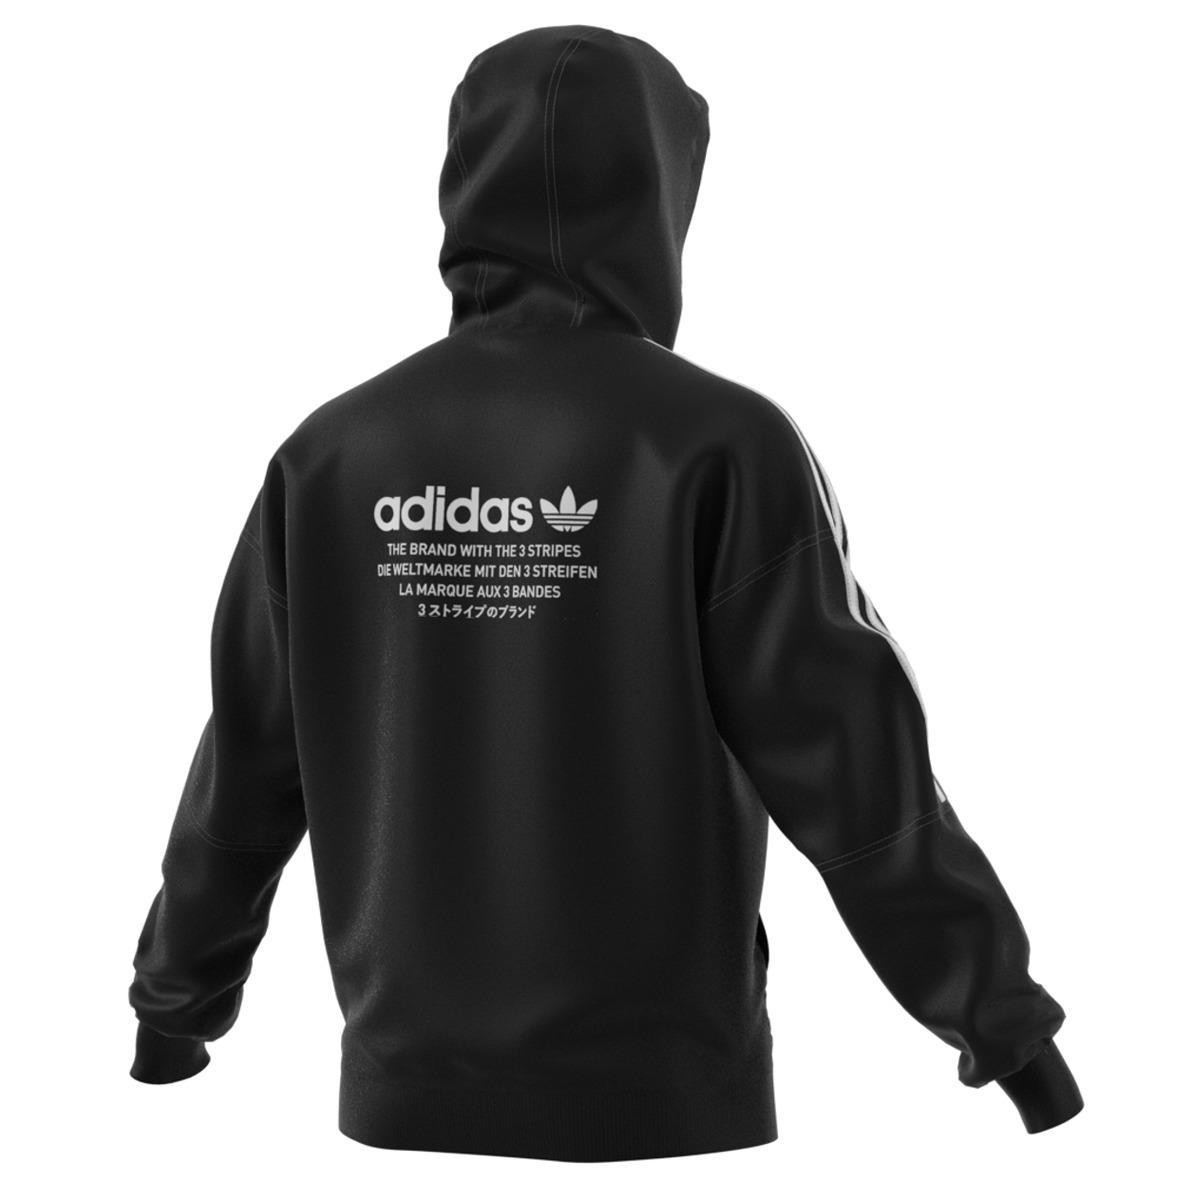 4ce9290560bd0 adidas Originals Nmd Sweatshirt in Black for Men - Lyst